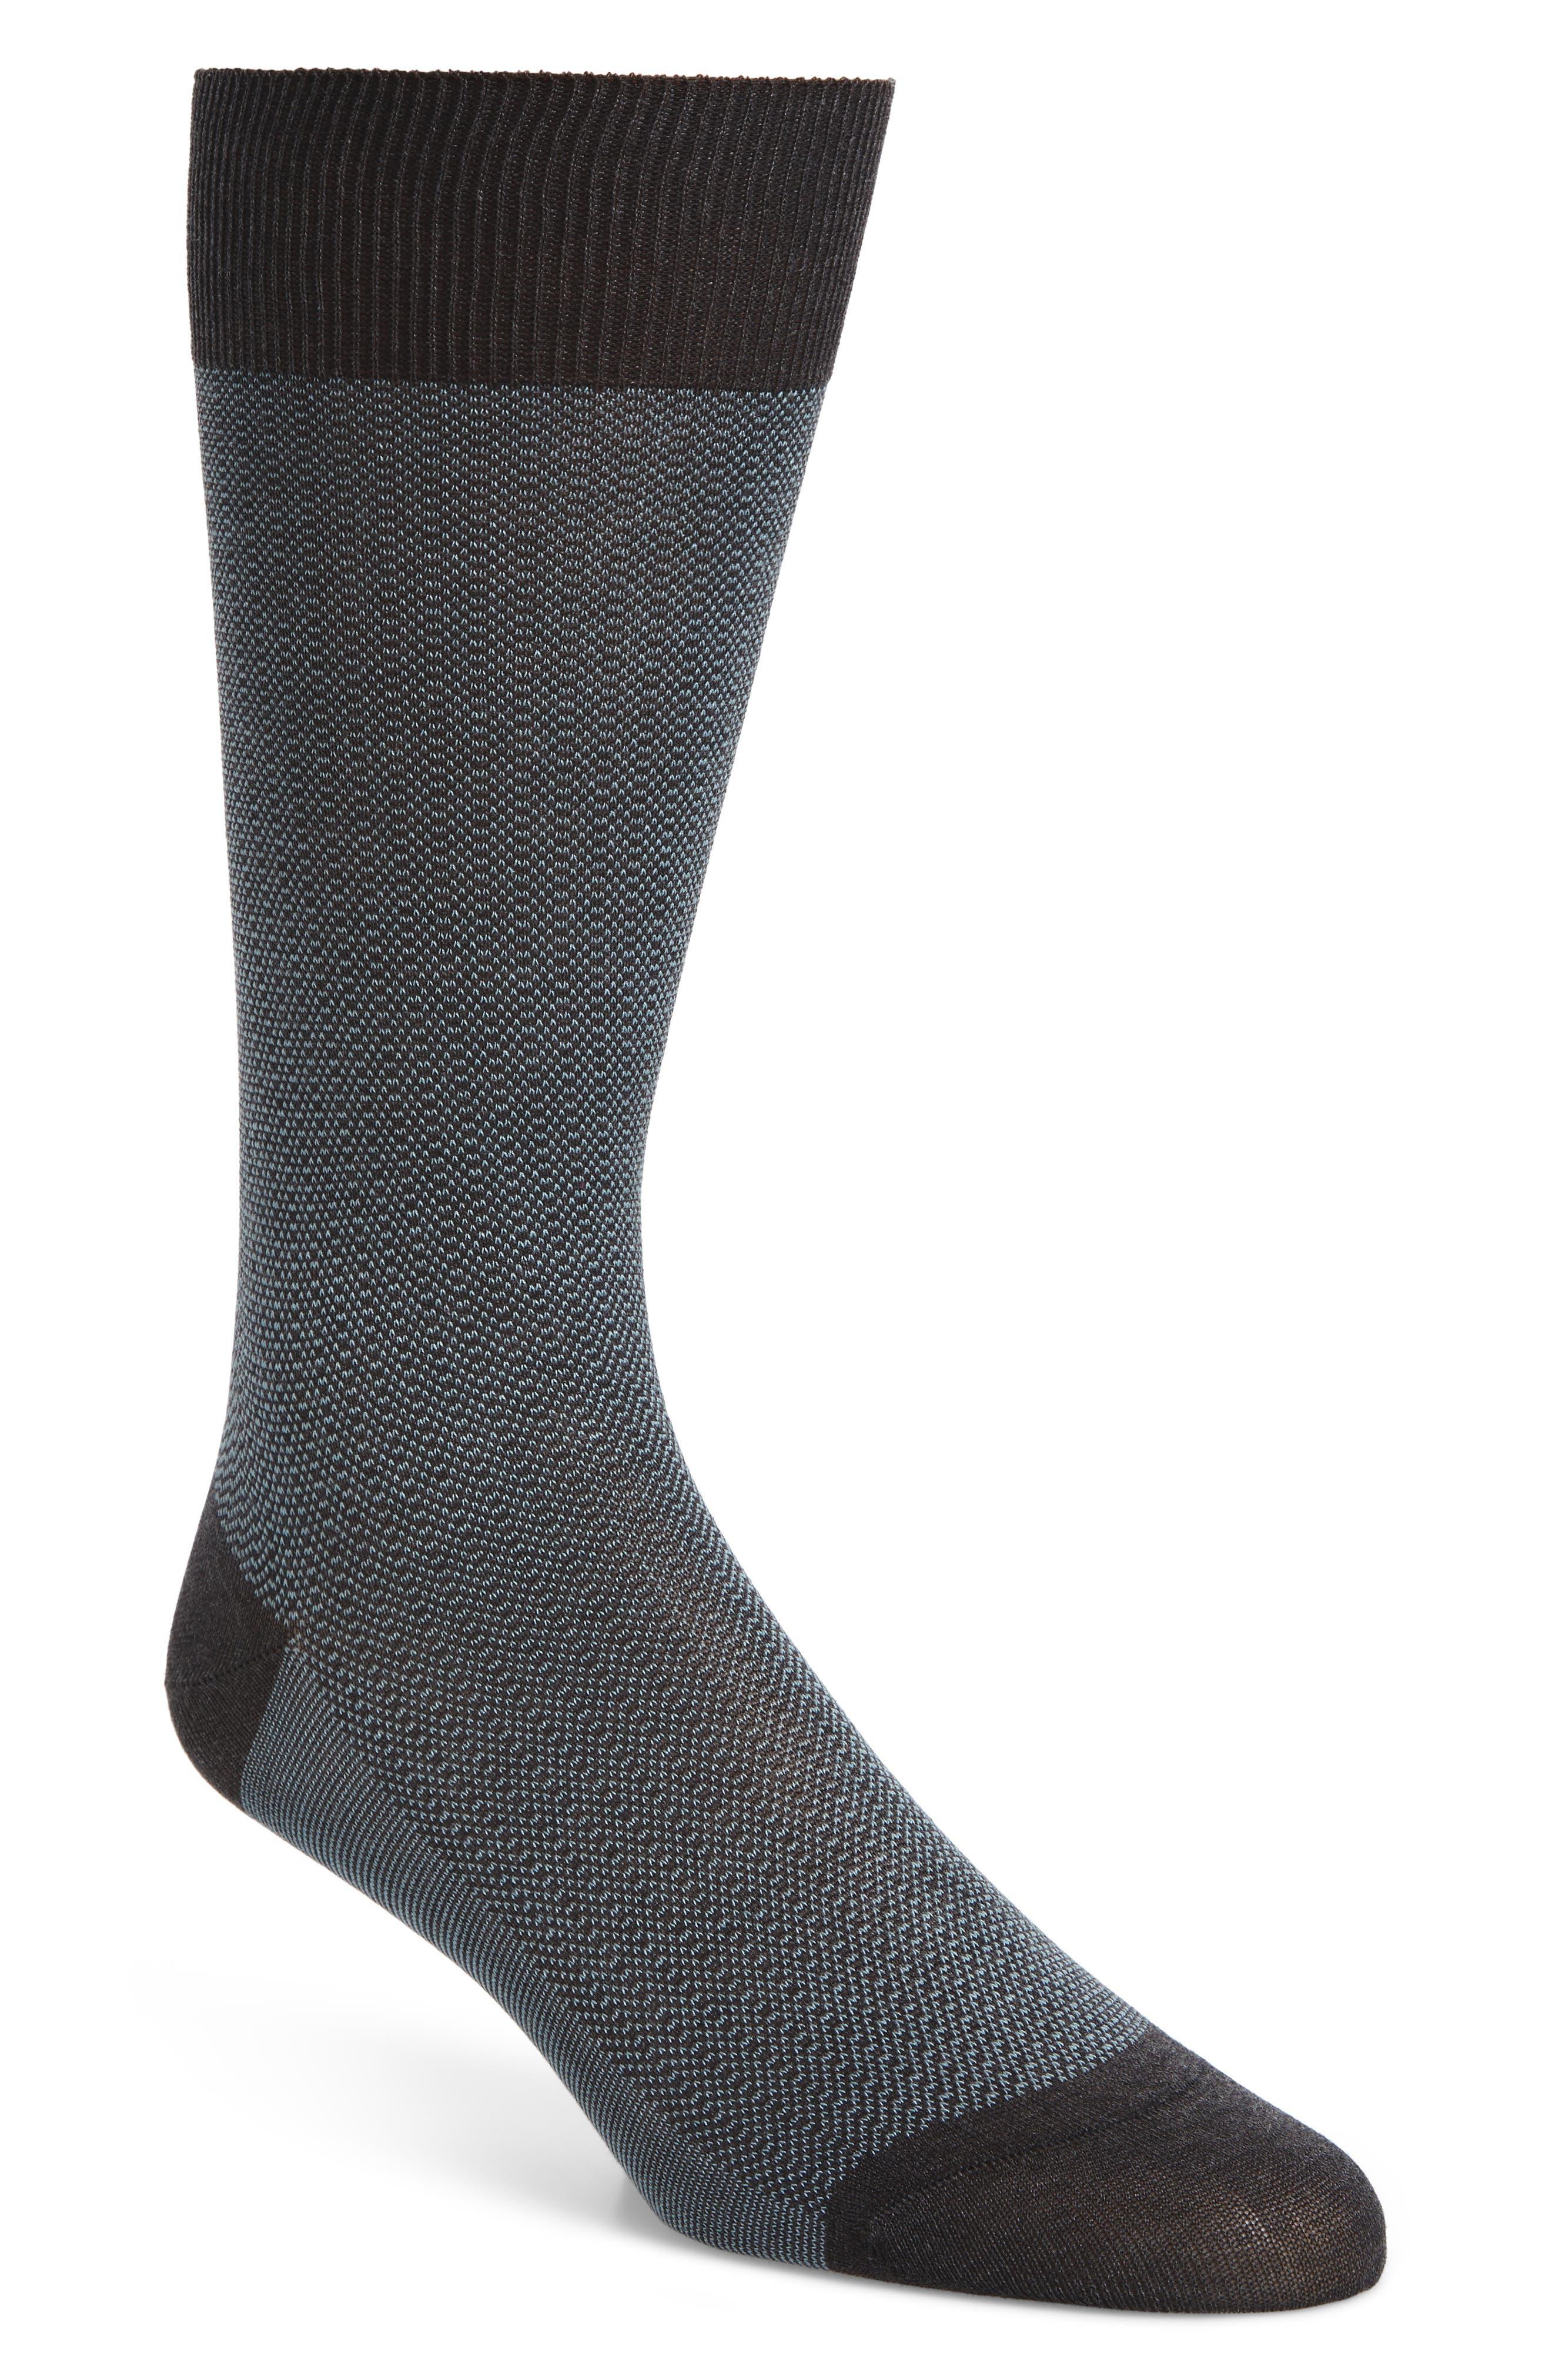 Birdseye Stripe Socks,                             Main thumbnail 1, color,                             Dark Grey